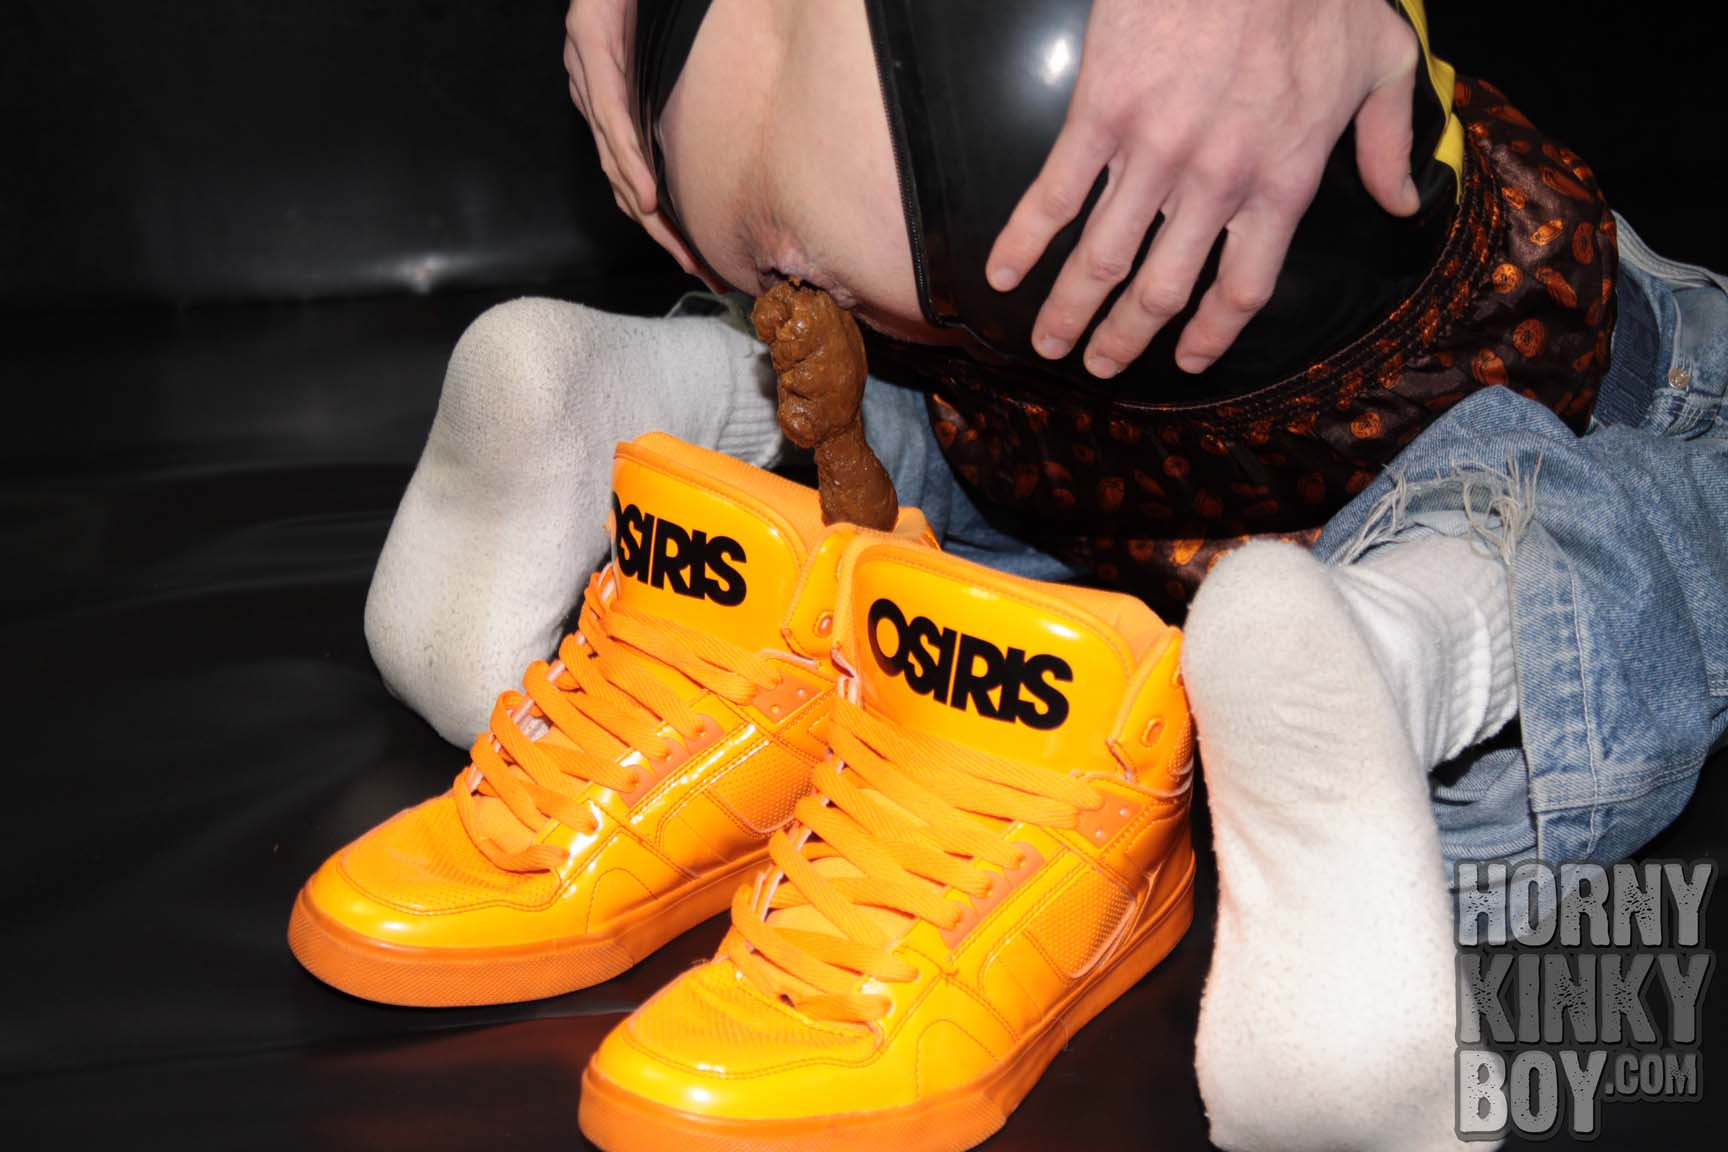 Piggish Rub Skater Lad Makes Poo Into Orange Skater Shoes